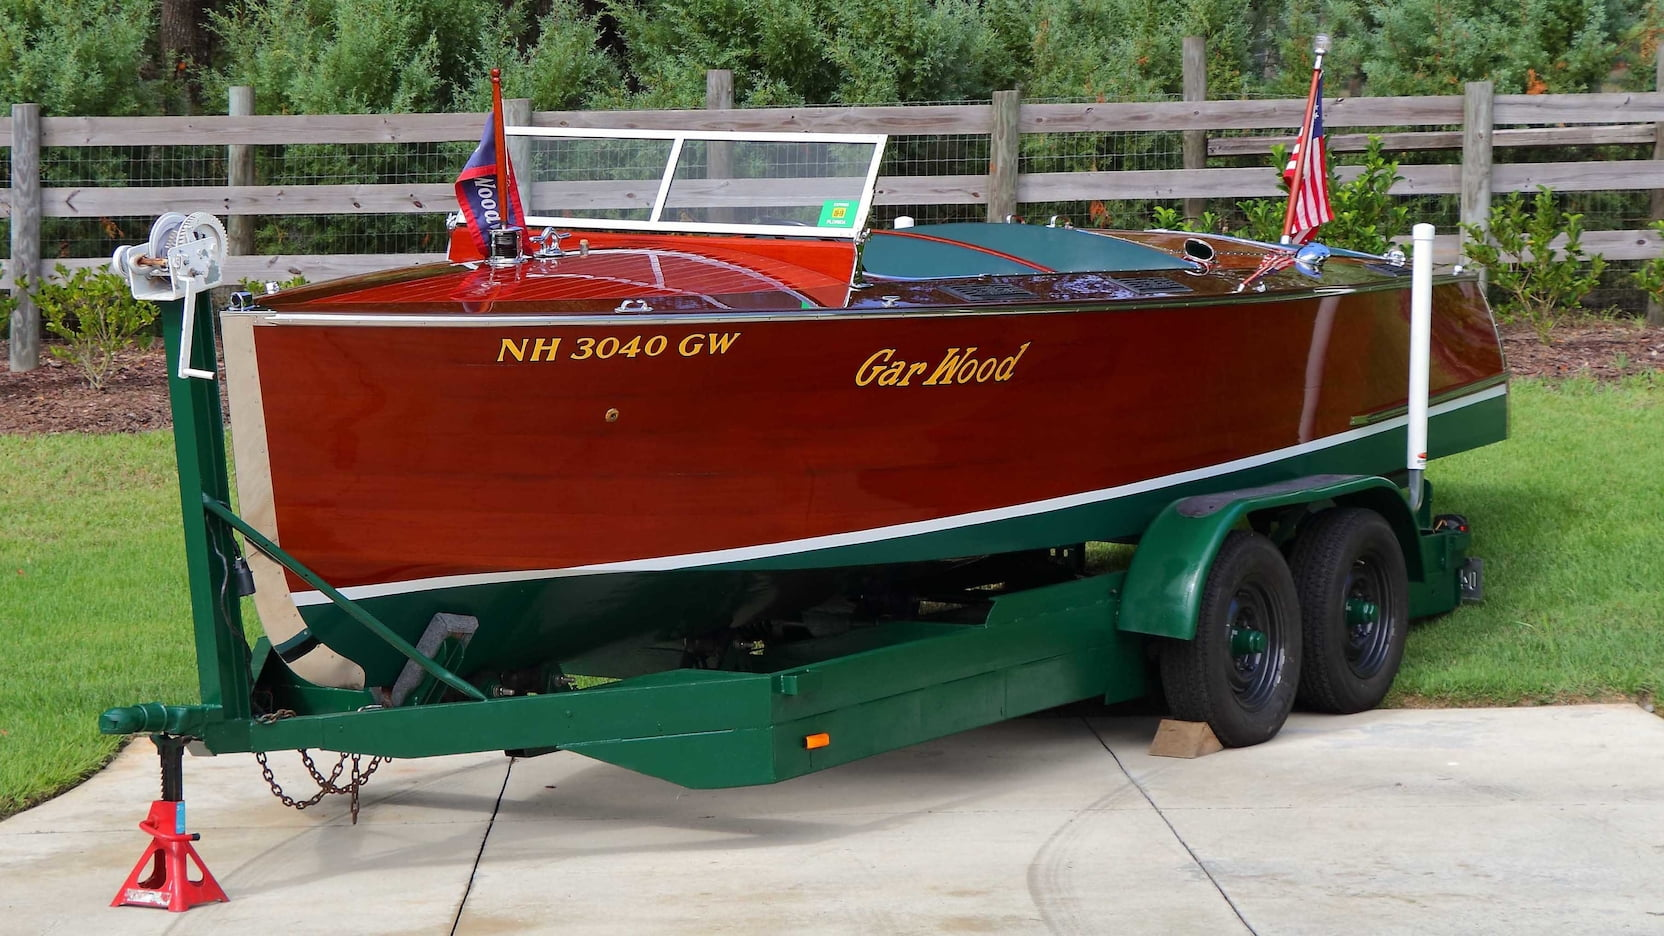 Gar Wood 22' Triple Cockpit runabout